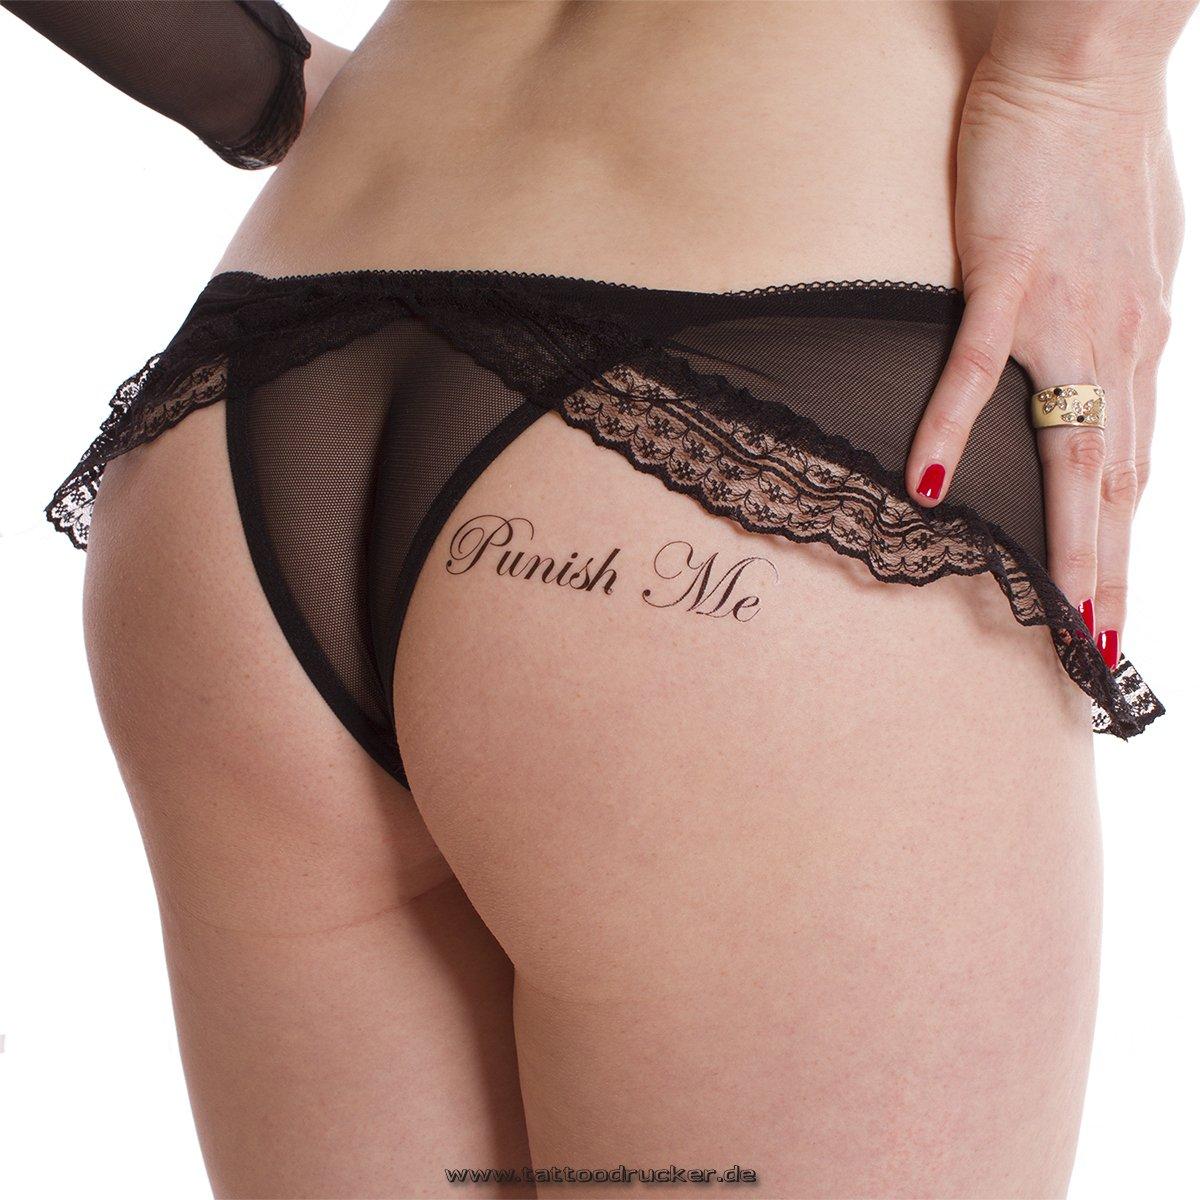 1 x Punish Me/Fuck Me Tattoo Schriftzug in schwarz - Sexy Kinky Tattoo (1x) Tattoodrucker PunishFuckMe1